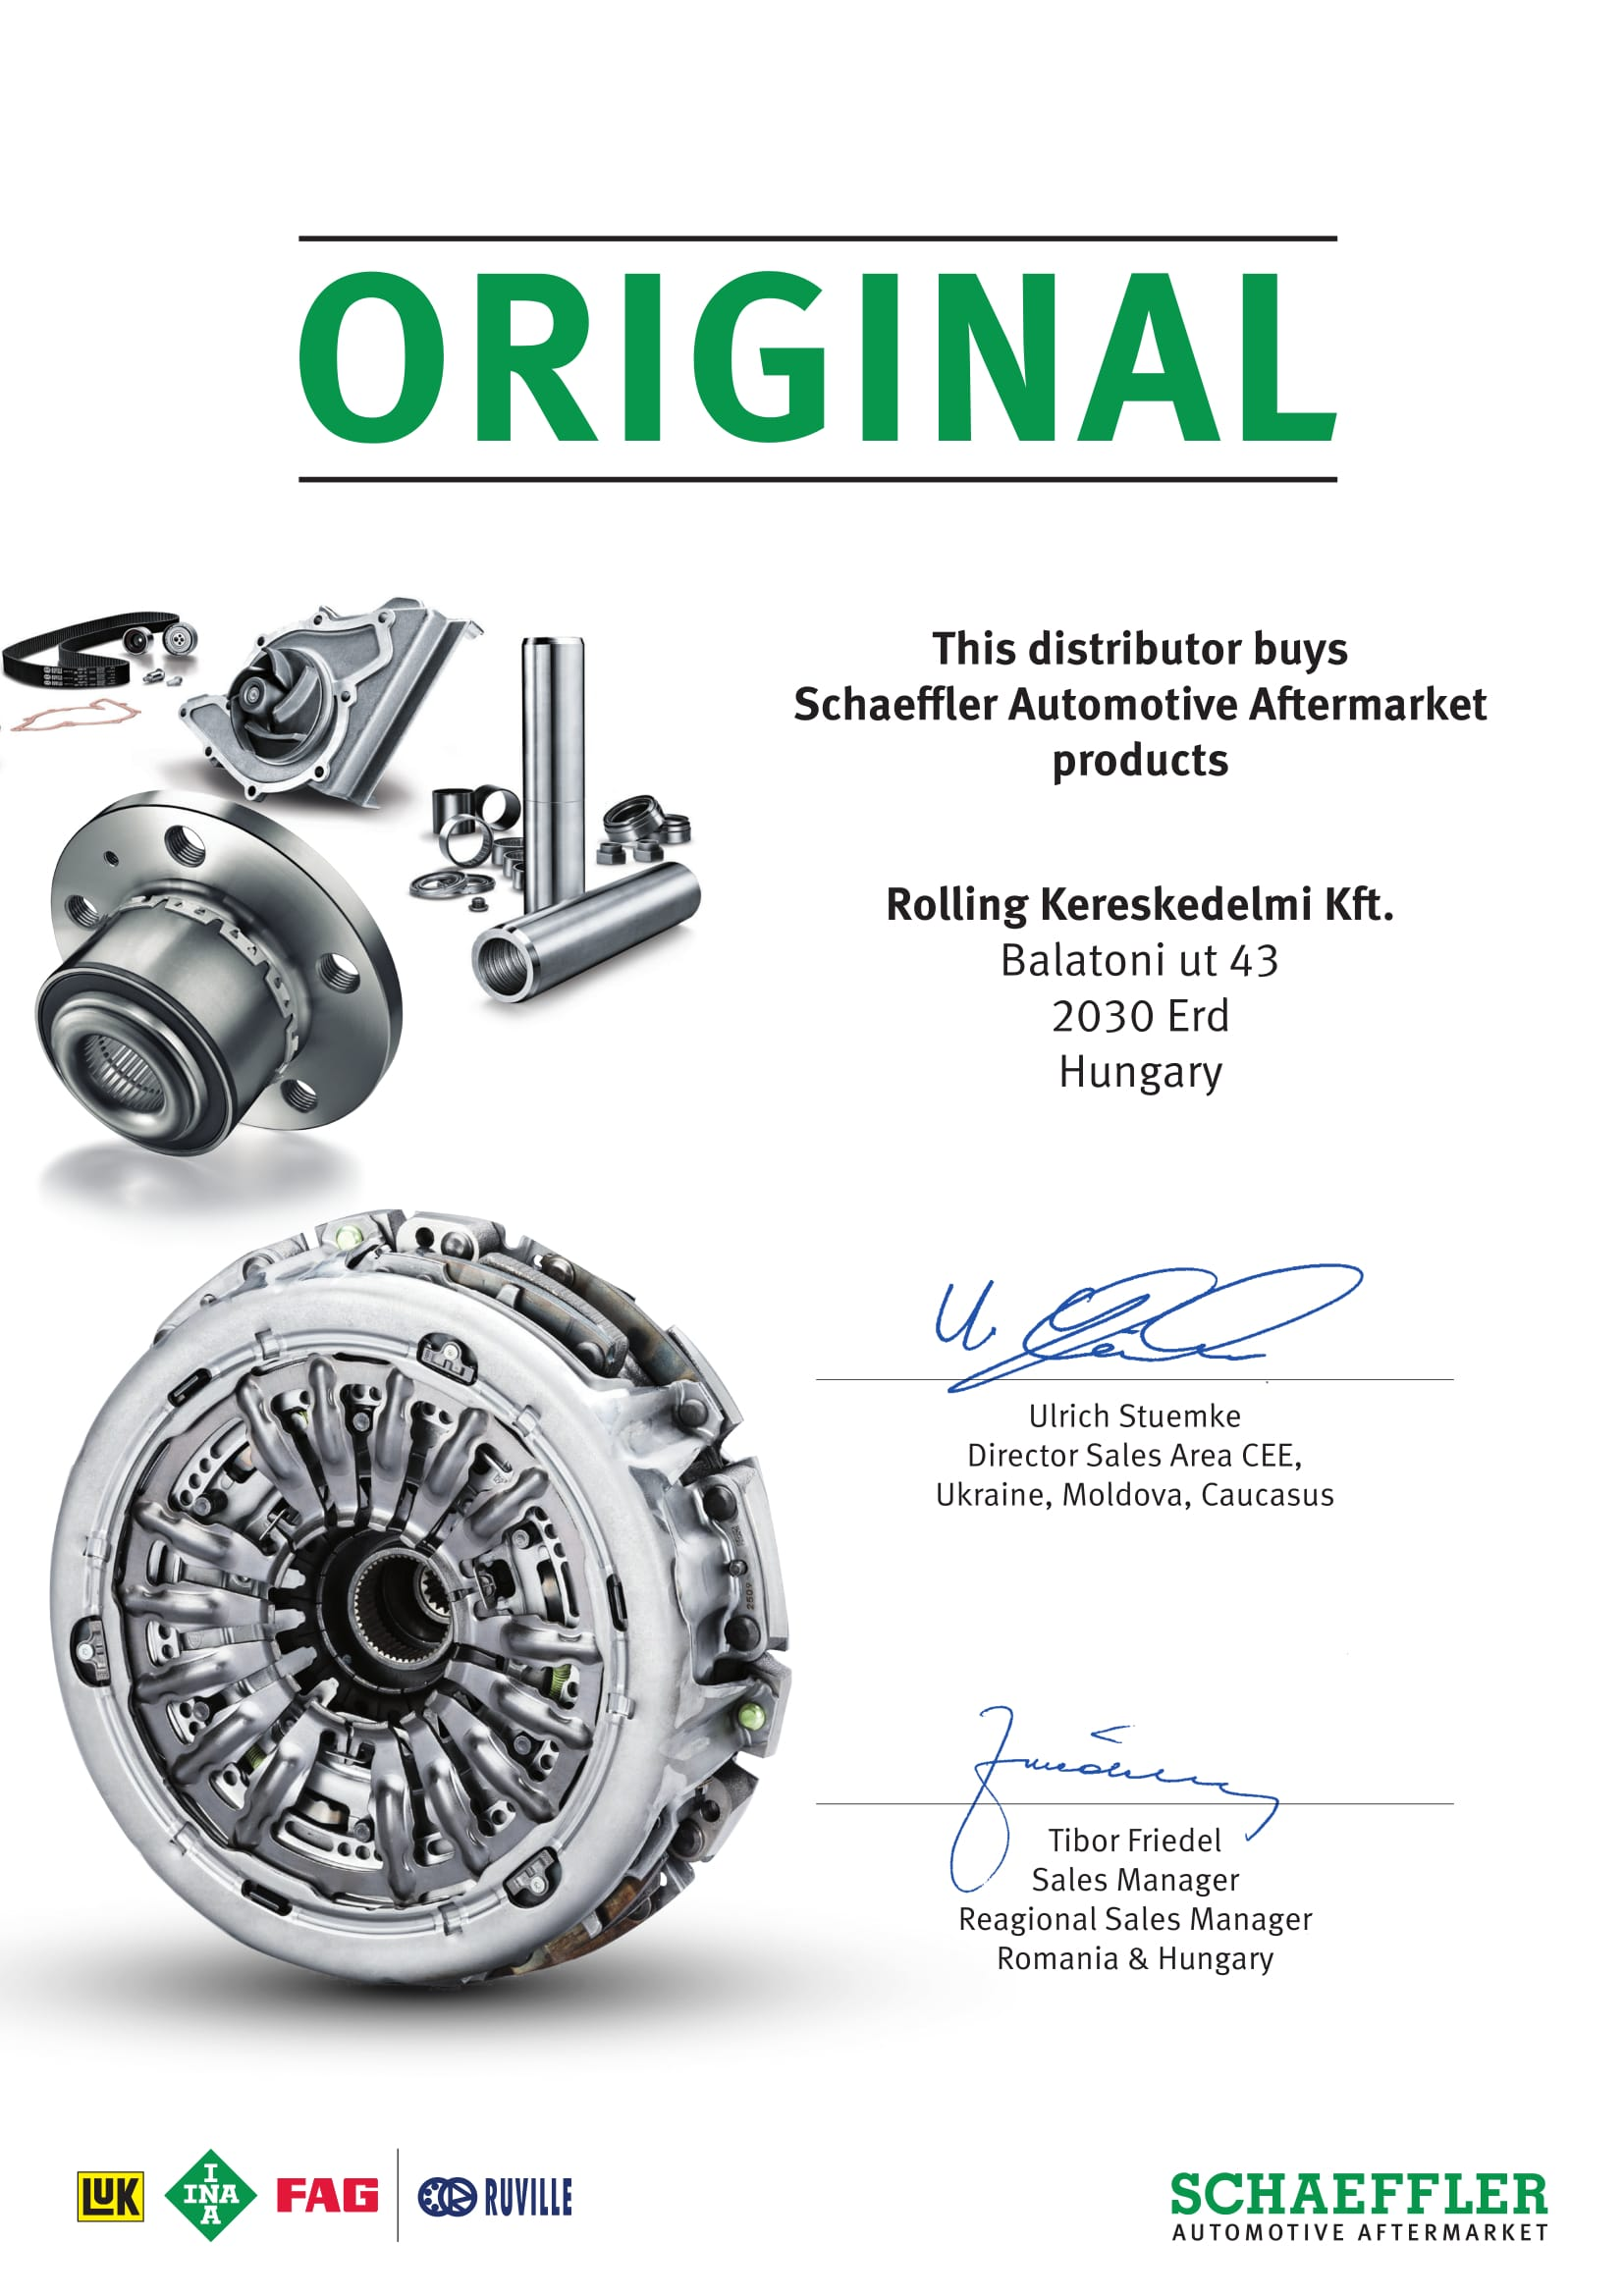 Schaeffler Automotive Aftermarket Distributor Certification